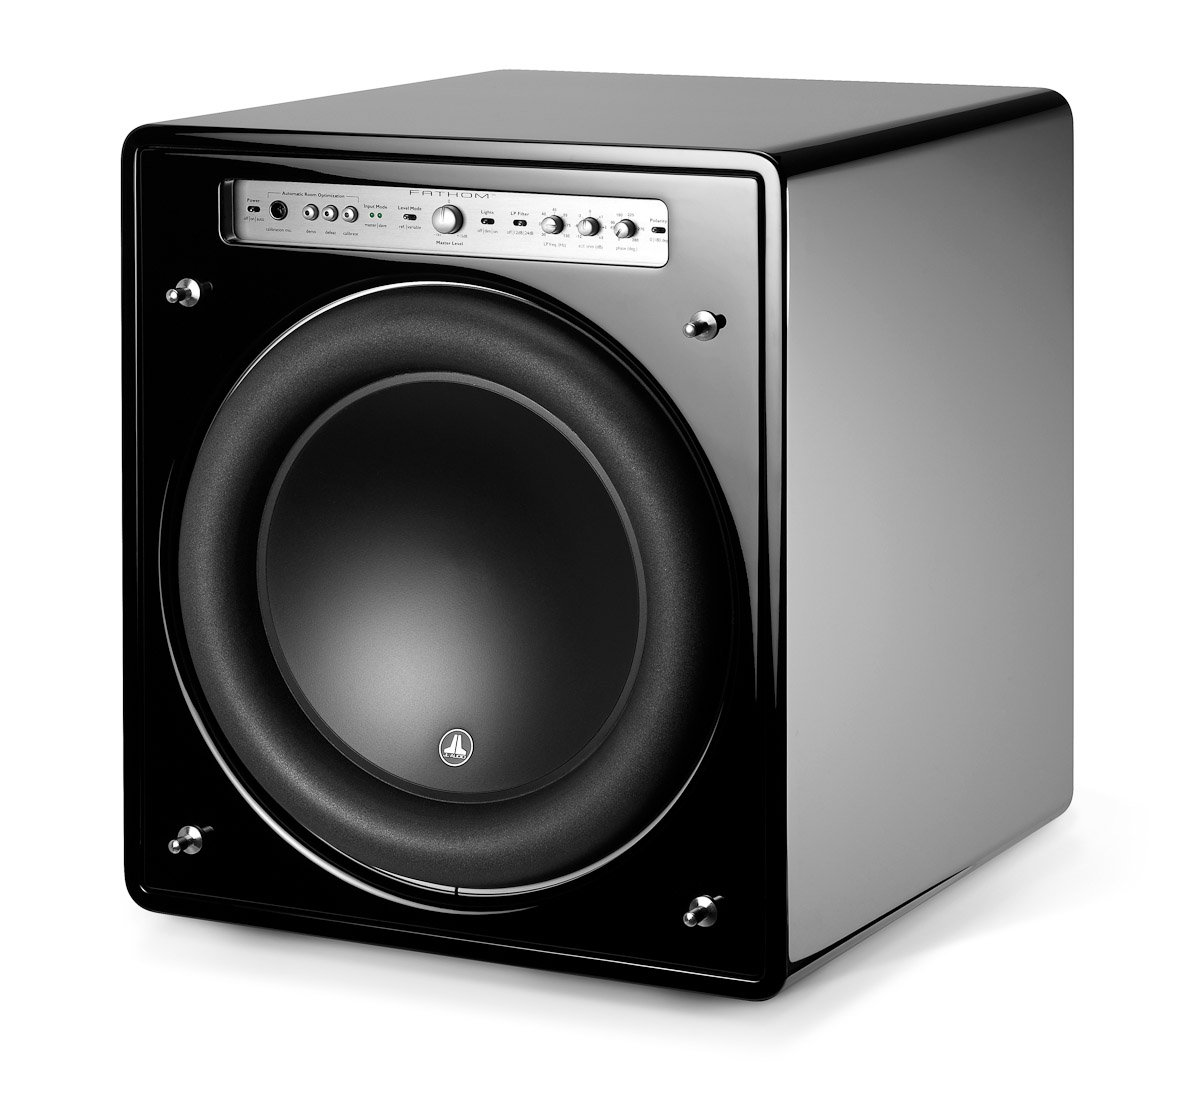 JL Audio 13.5 Fathom Series Powered Subwoofer Black Gloss Finish F113 Gloss